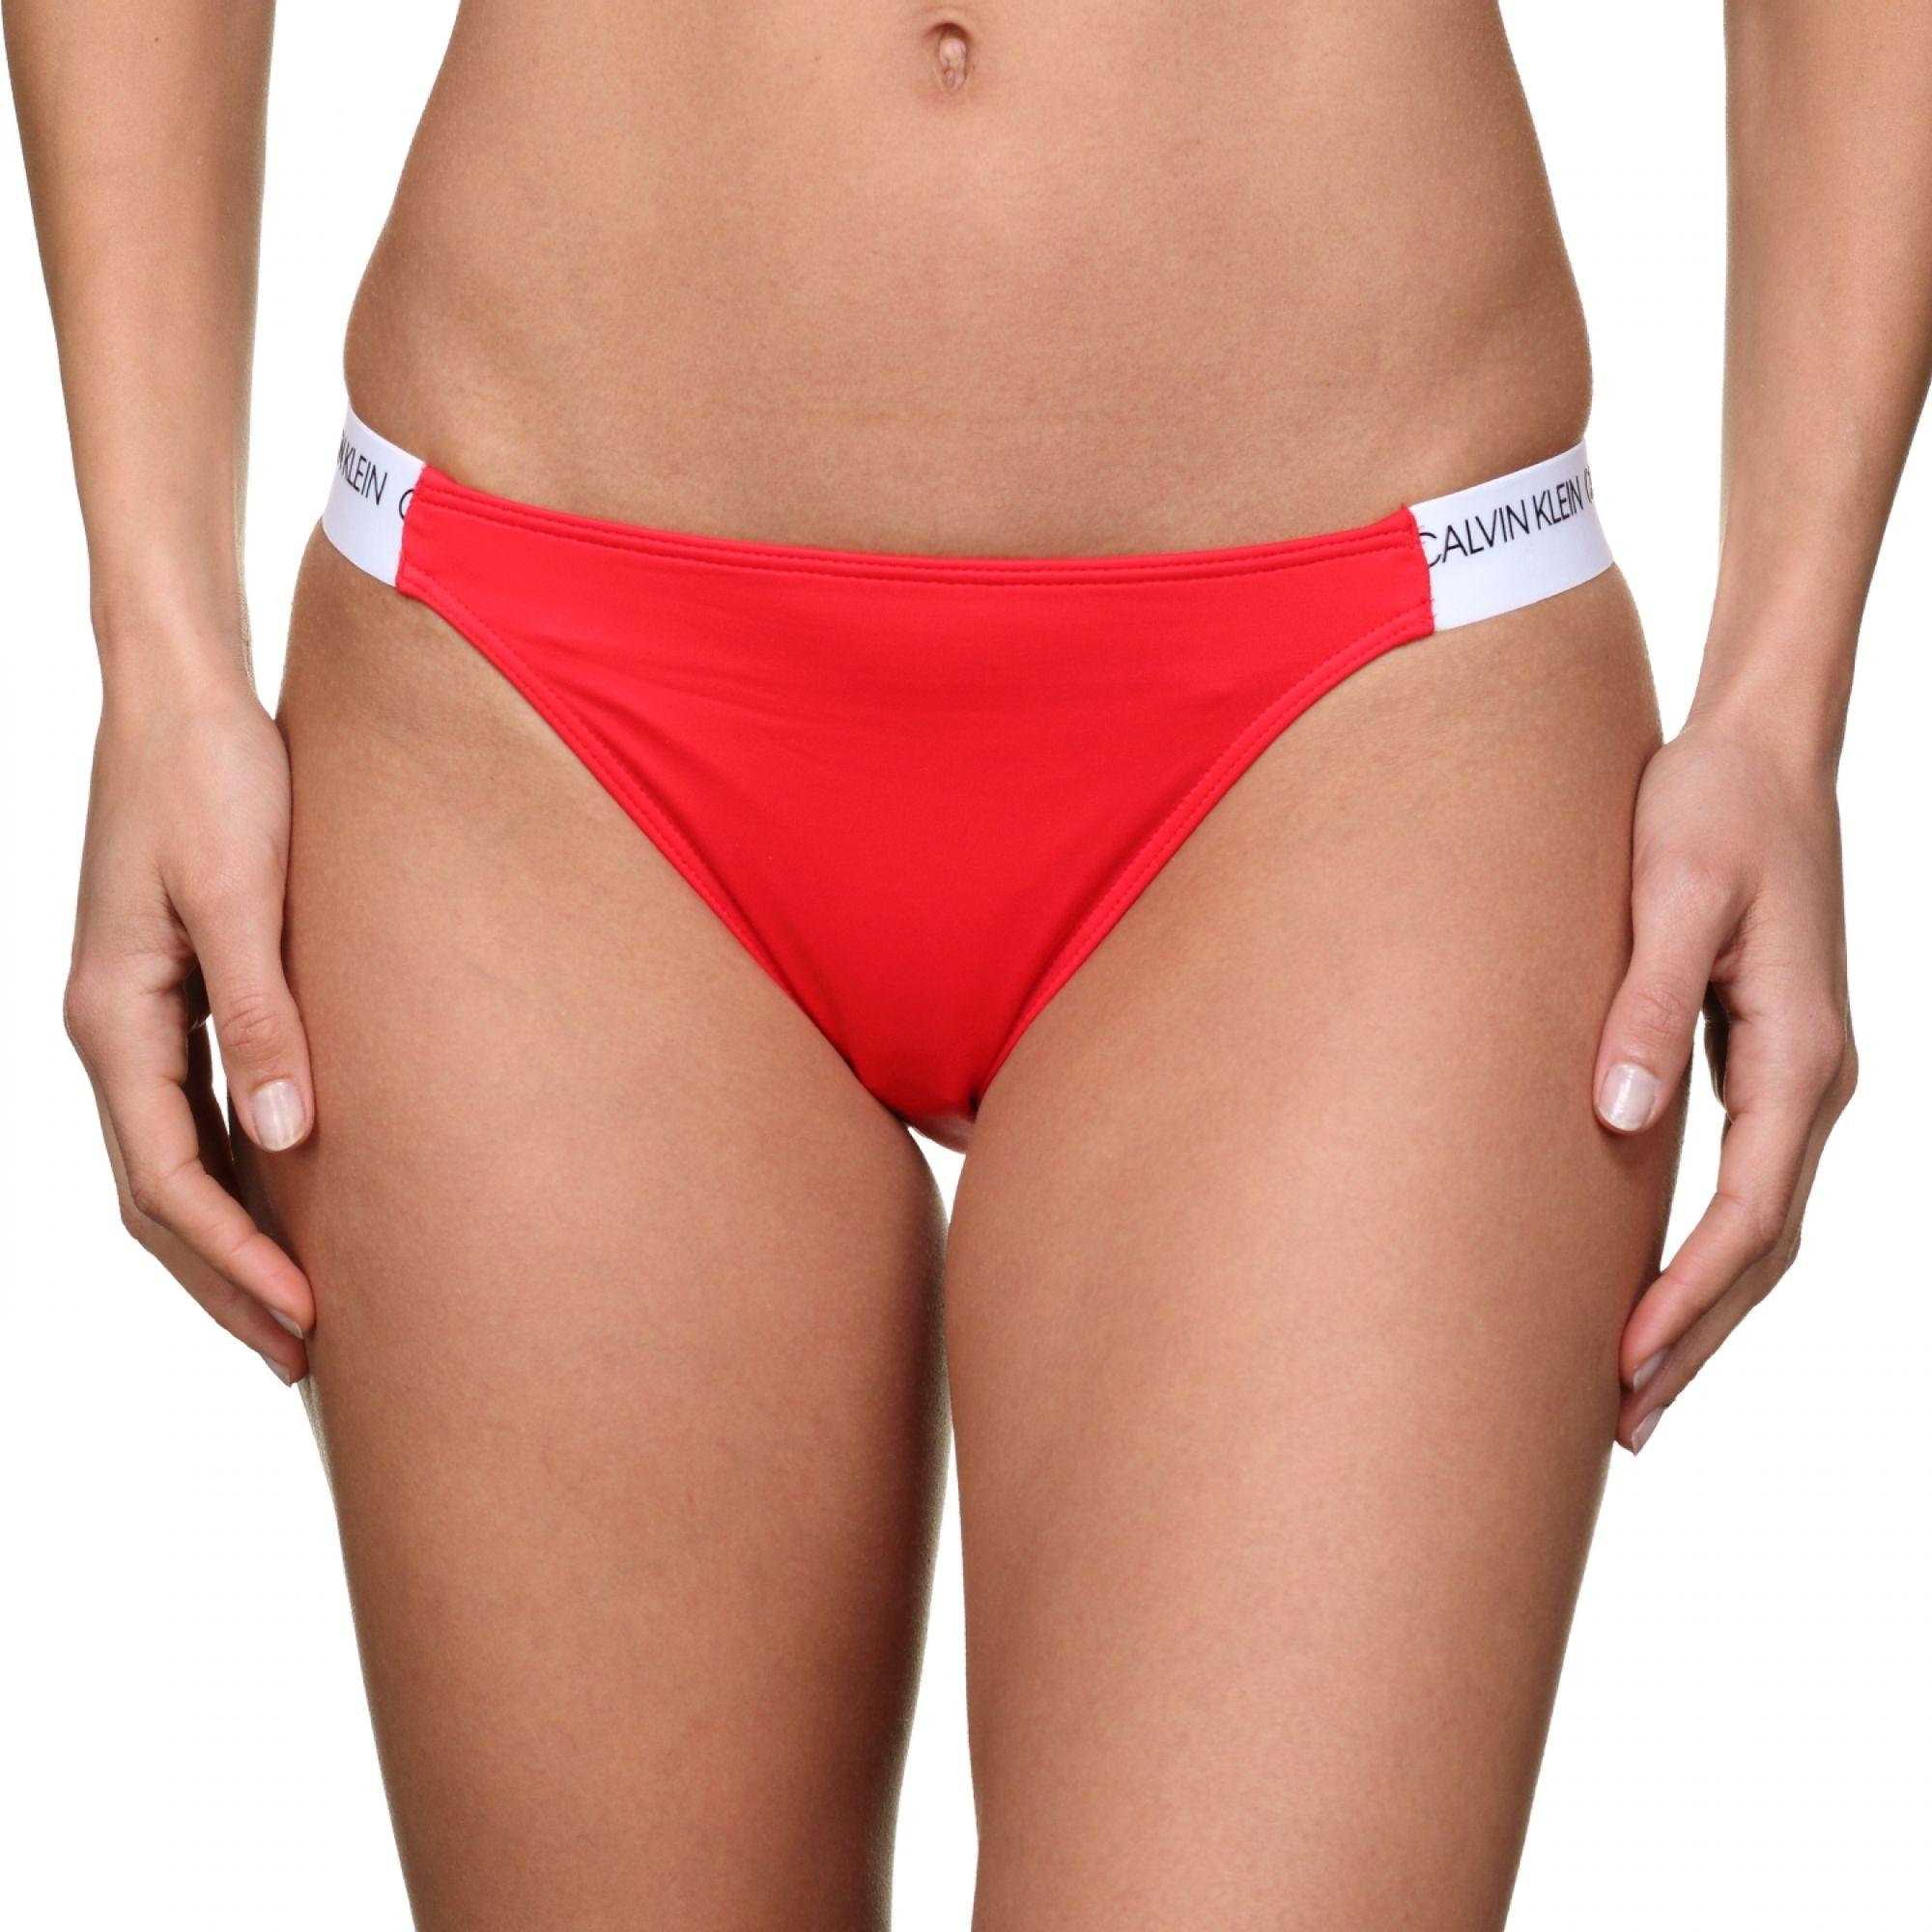 Dámský spodní díl plavek Calvin Klein - Cheeky bikiny červená